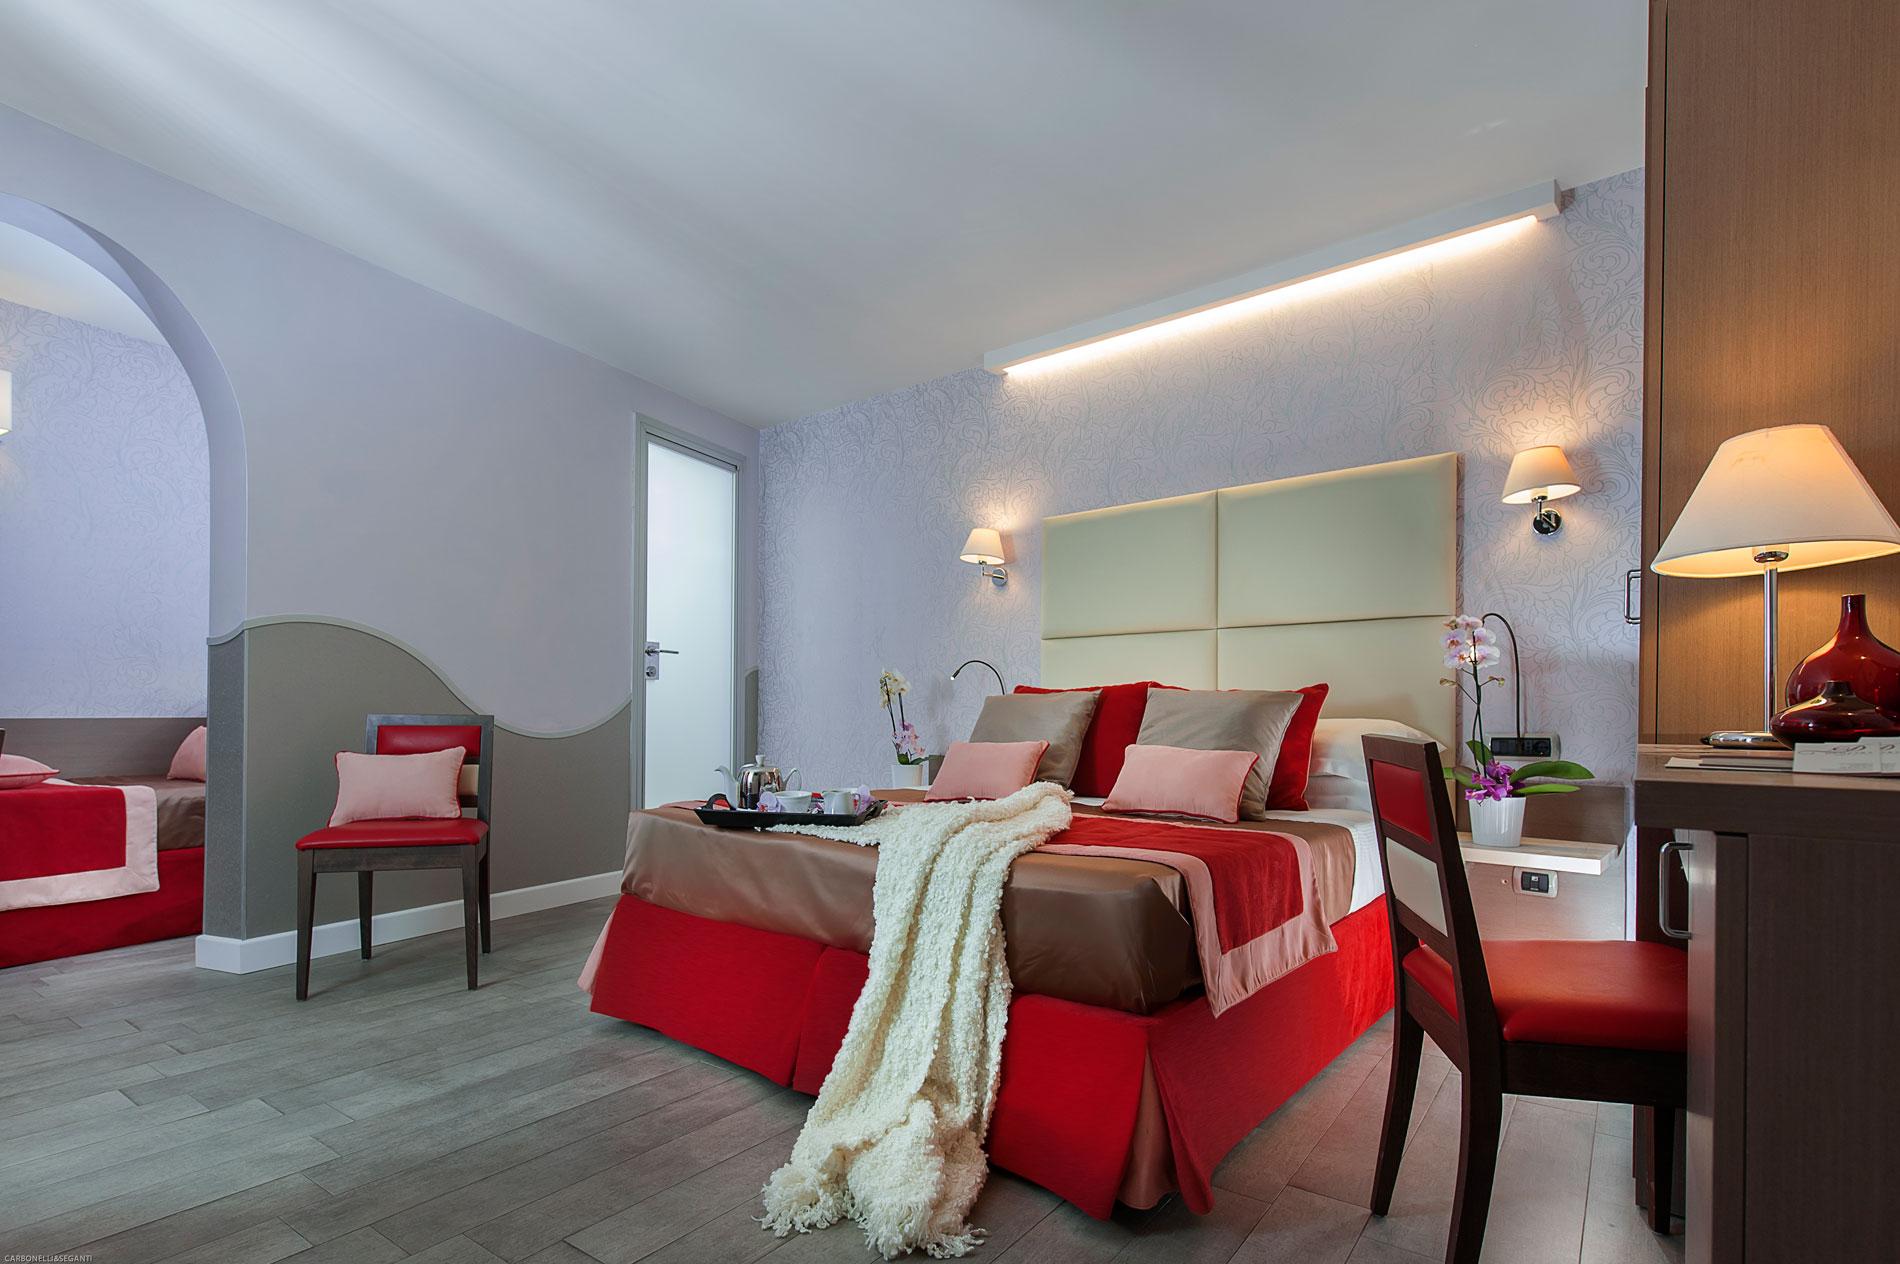 chambre triple hôtel rome - chambre triple rome - hôtel rome